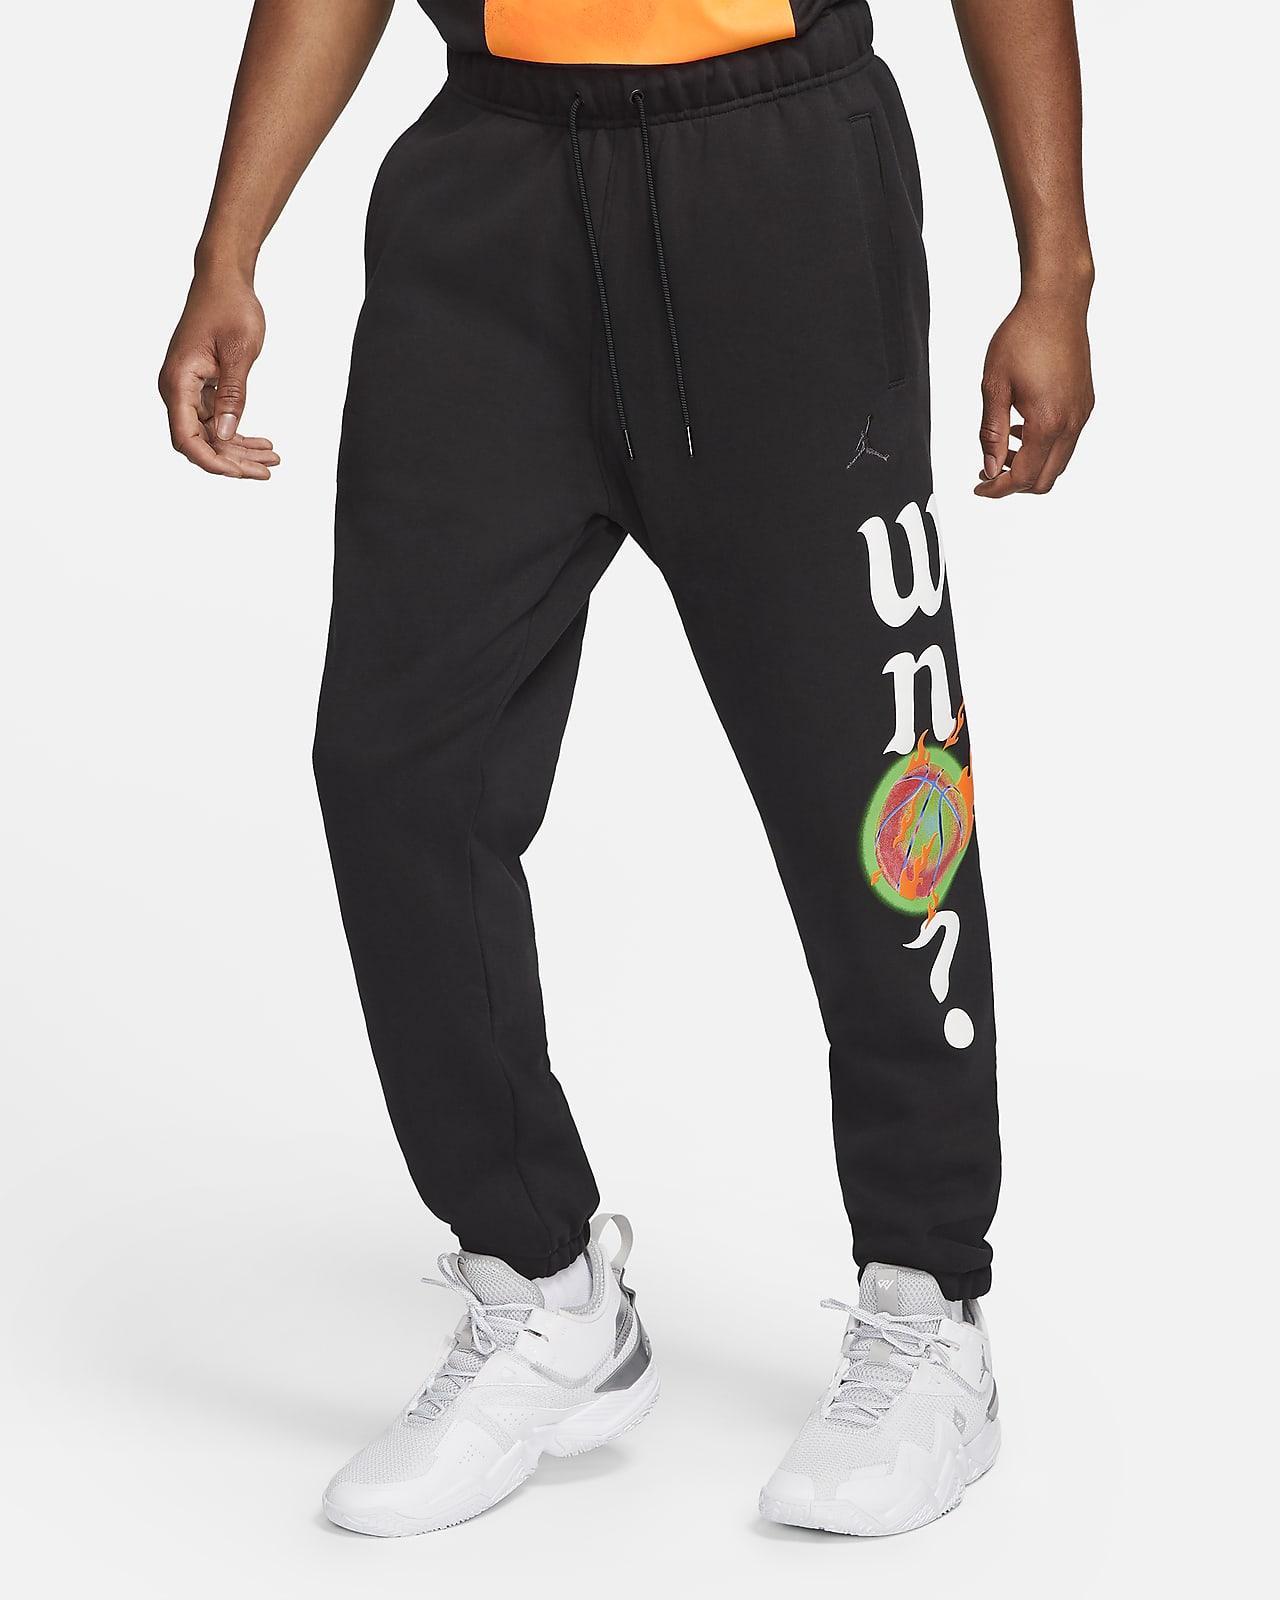 Jordan 'Why Not?' Men's Fleece Trousers